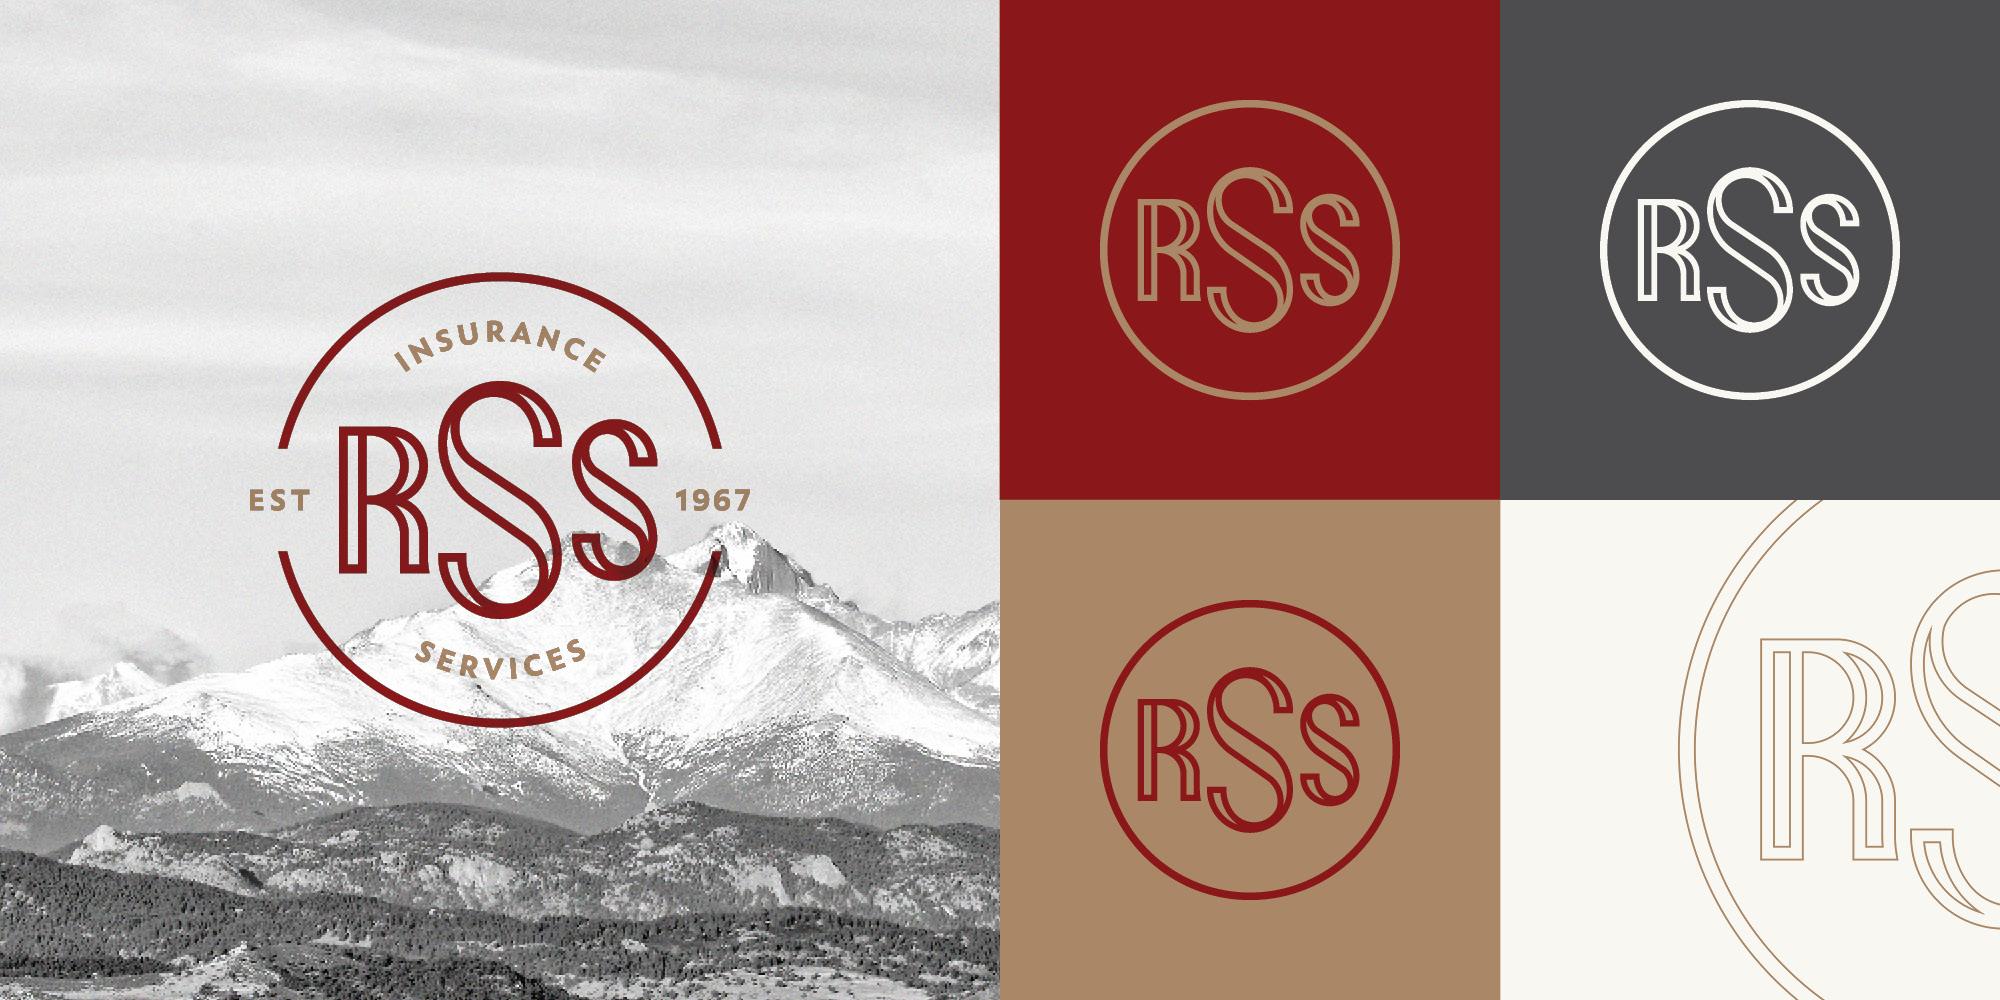 Logos_Tiles_RSS.jpg